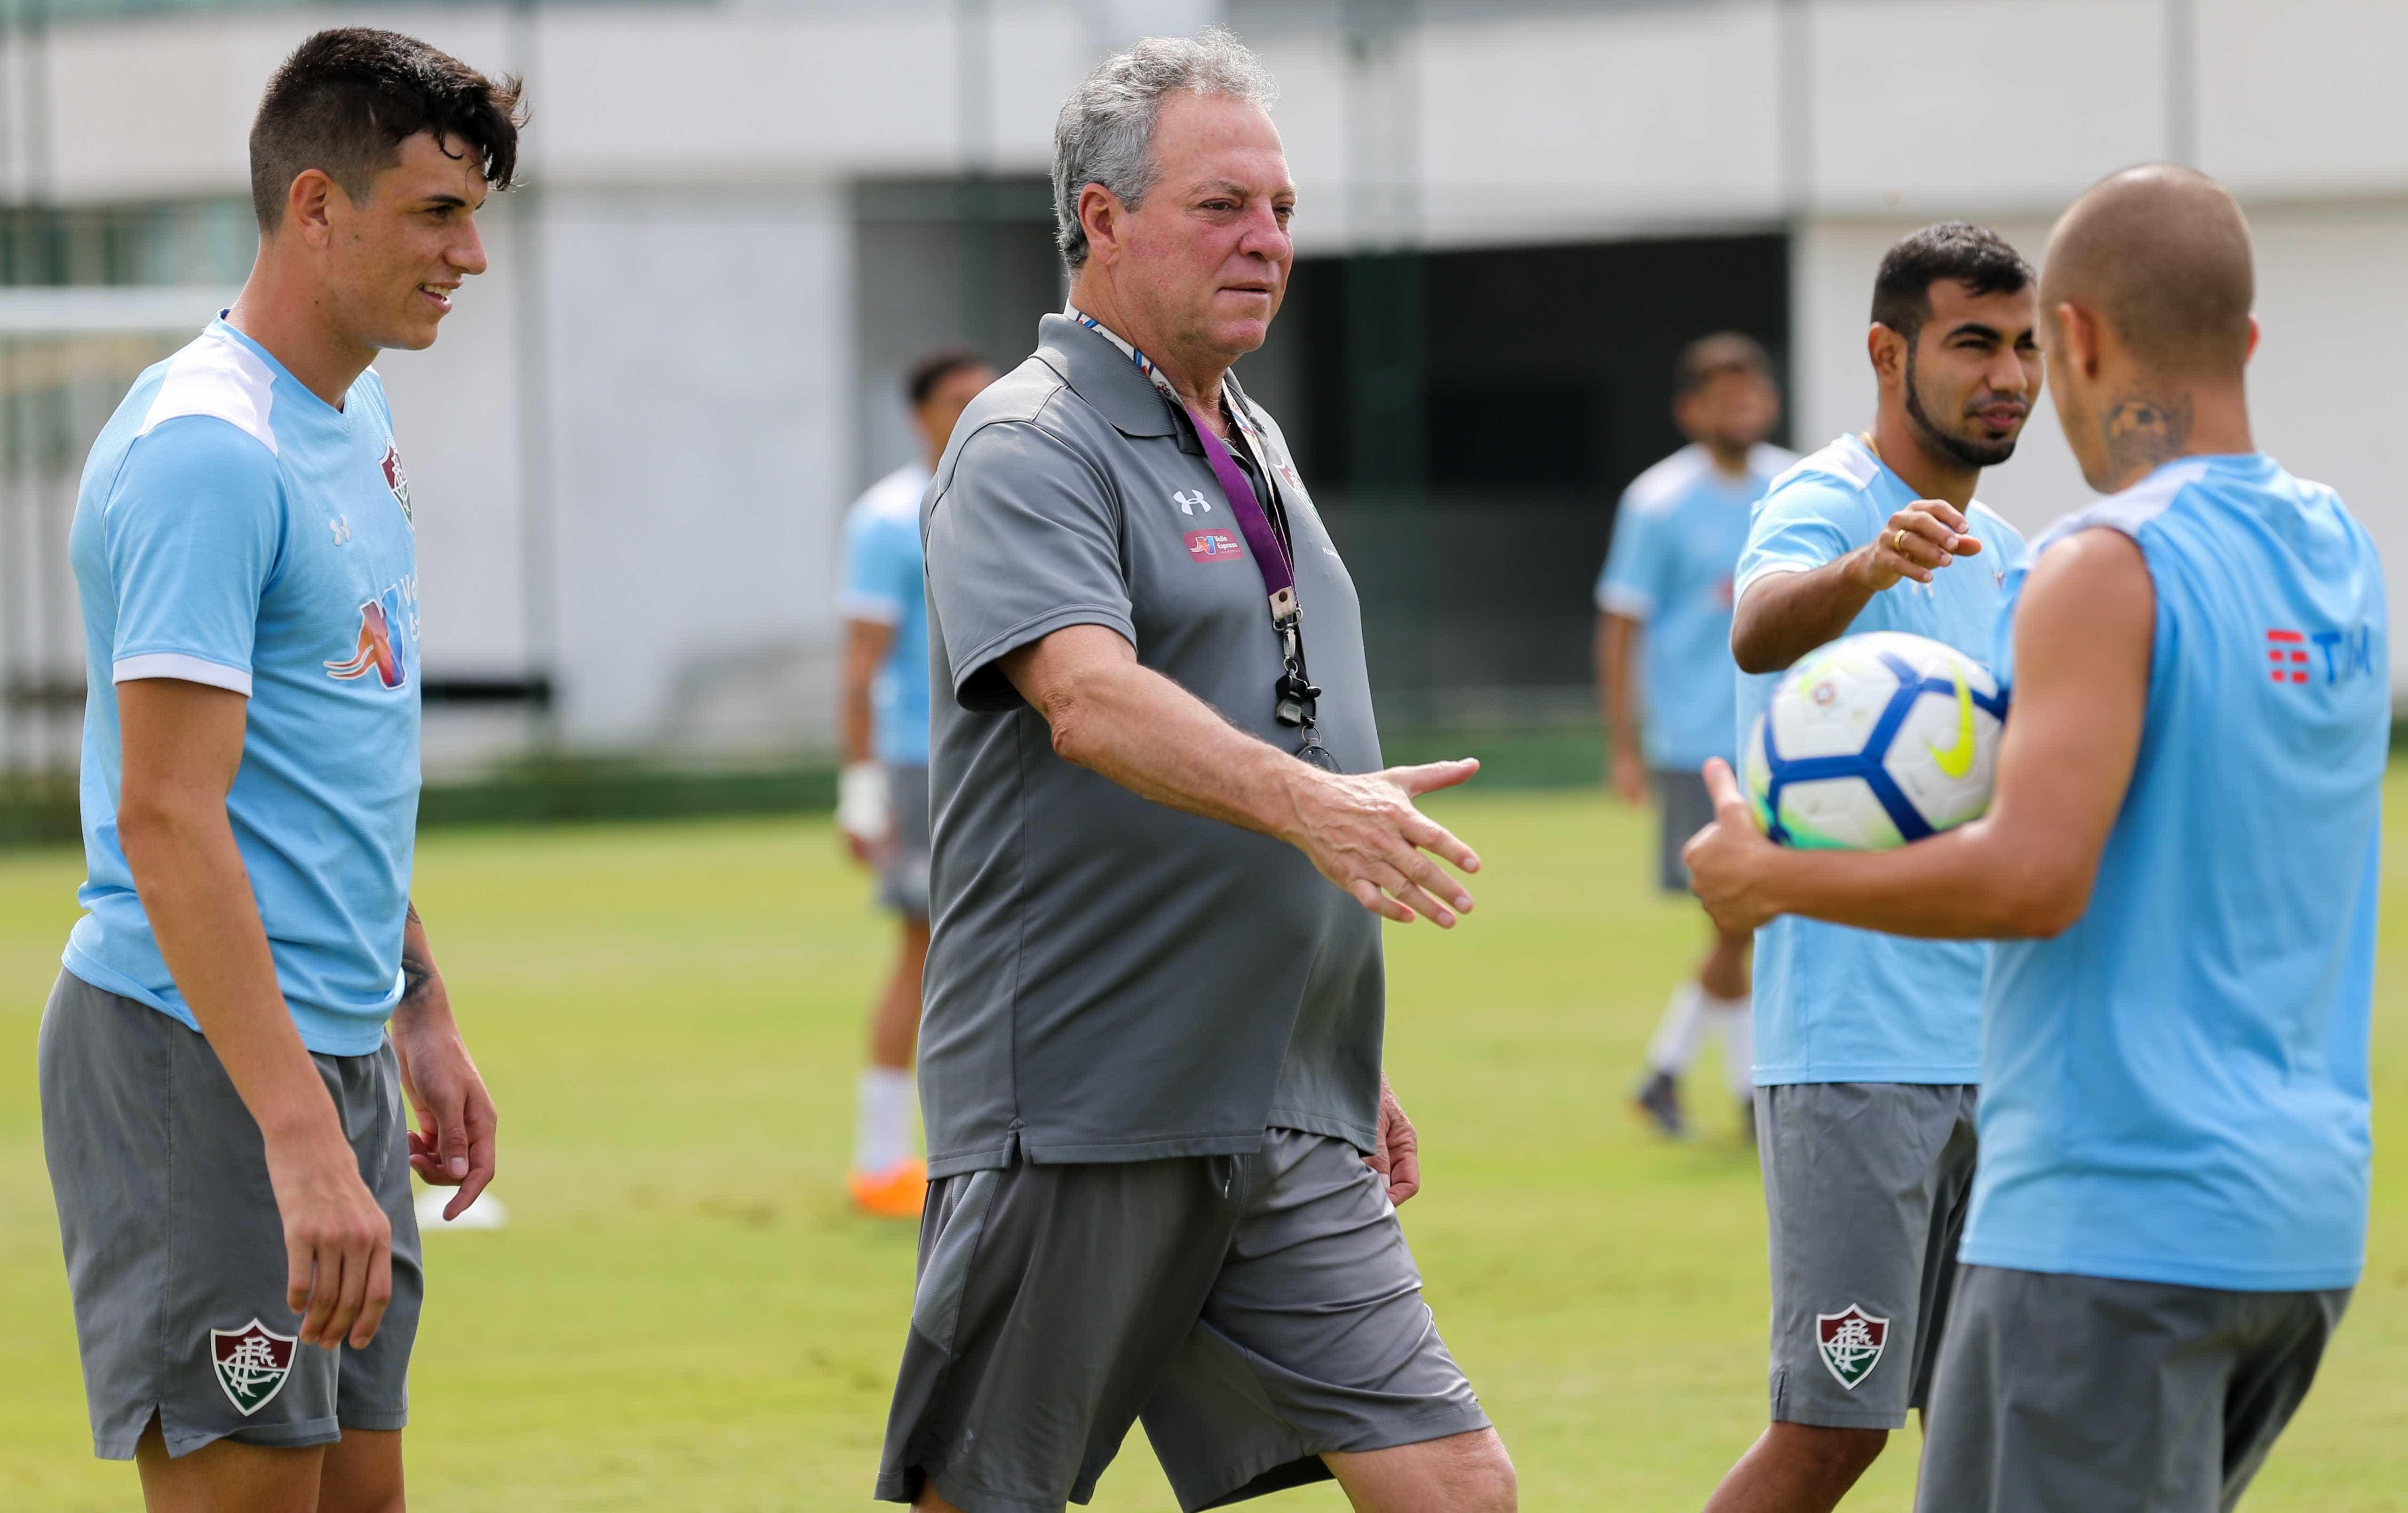 Dividido, Fluminense visita o Vitória e tenta se consolidar